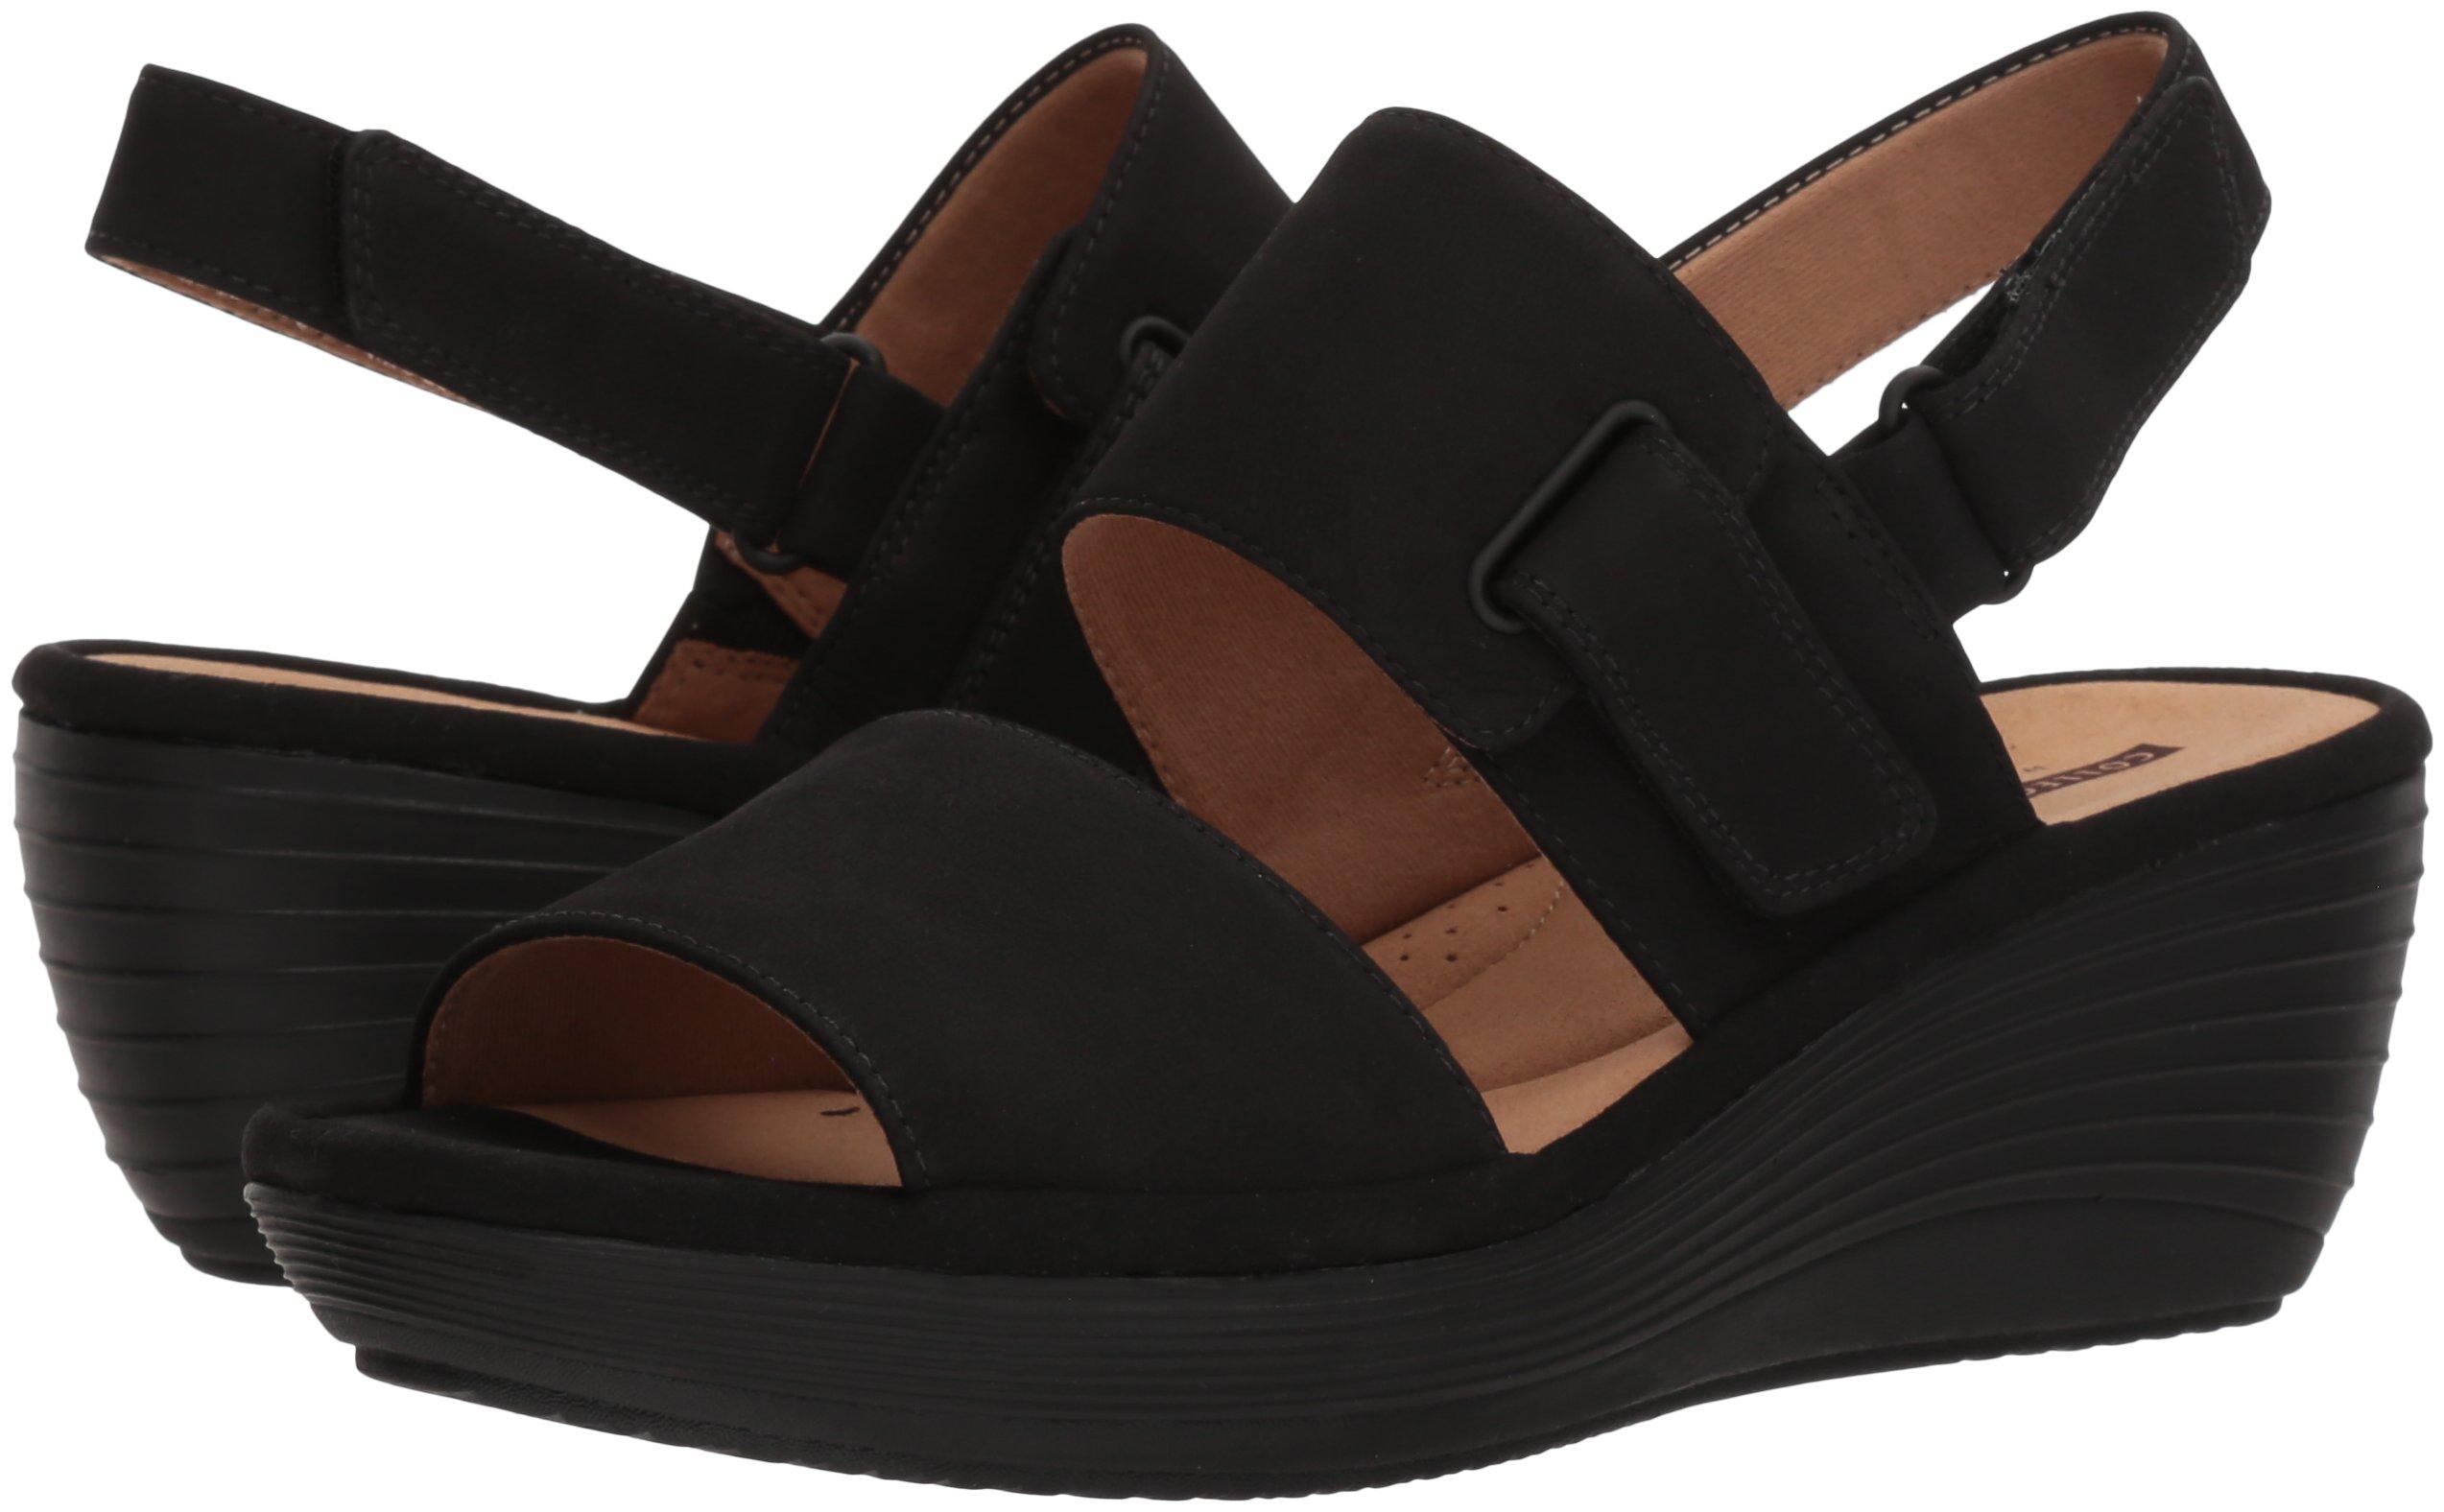 09a6fb2f CLARKS Women's Reedly Breen Wedge Sandal, Black Nubuck, 8 Medium US -  26133952-2-8 Medium US < Platforms & Wedges < Clothing, Shoes & Jewelry -  tibs